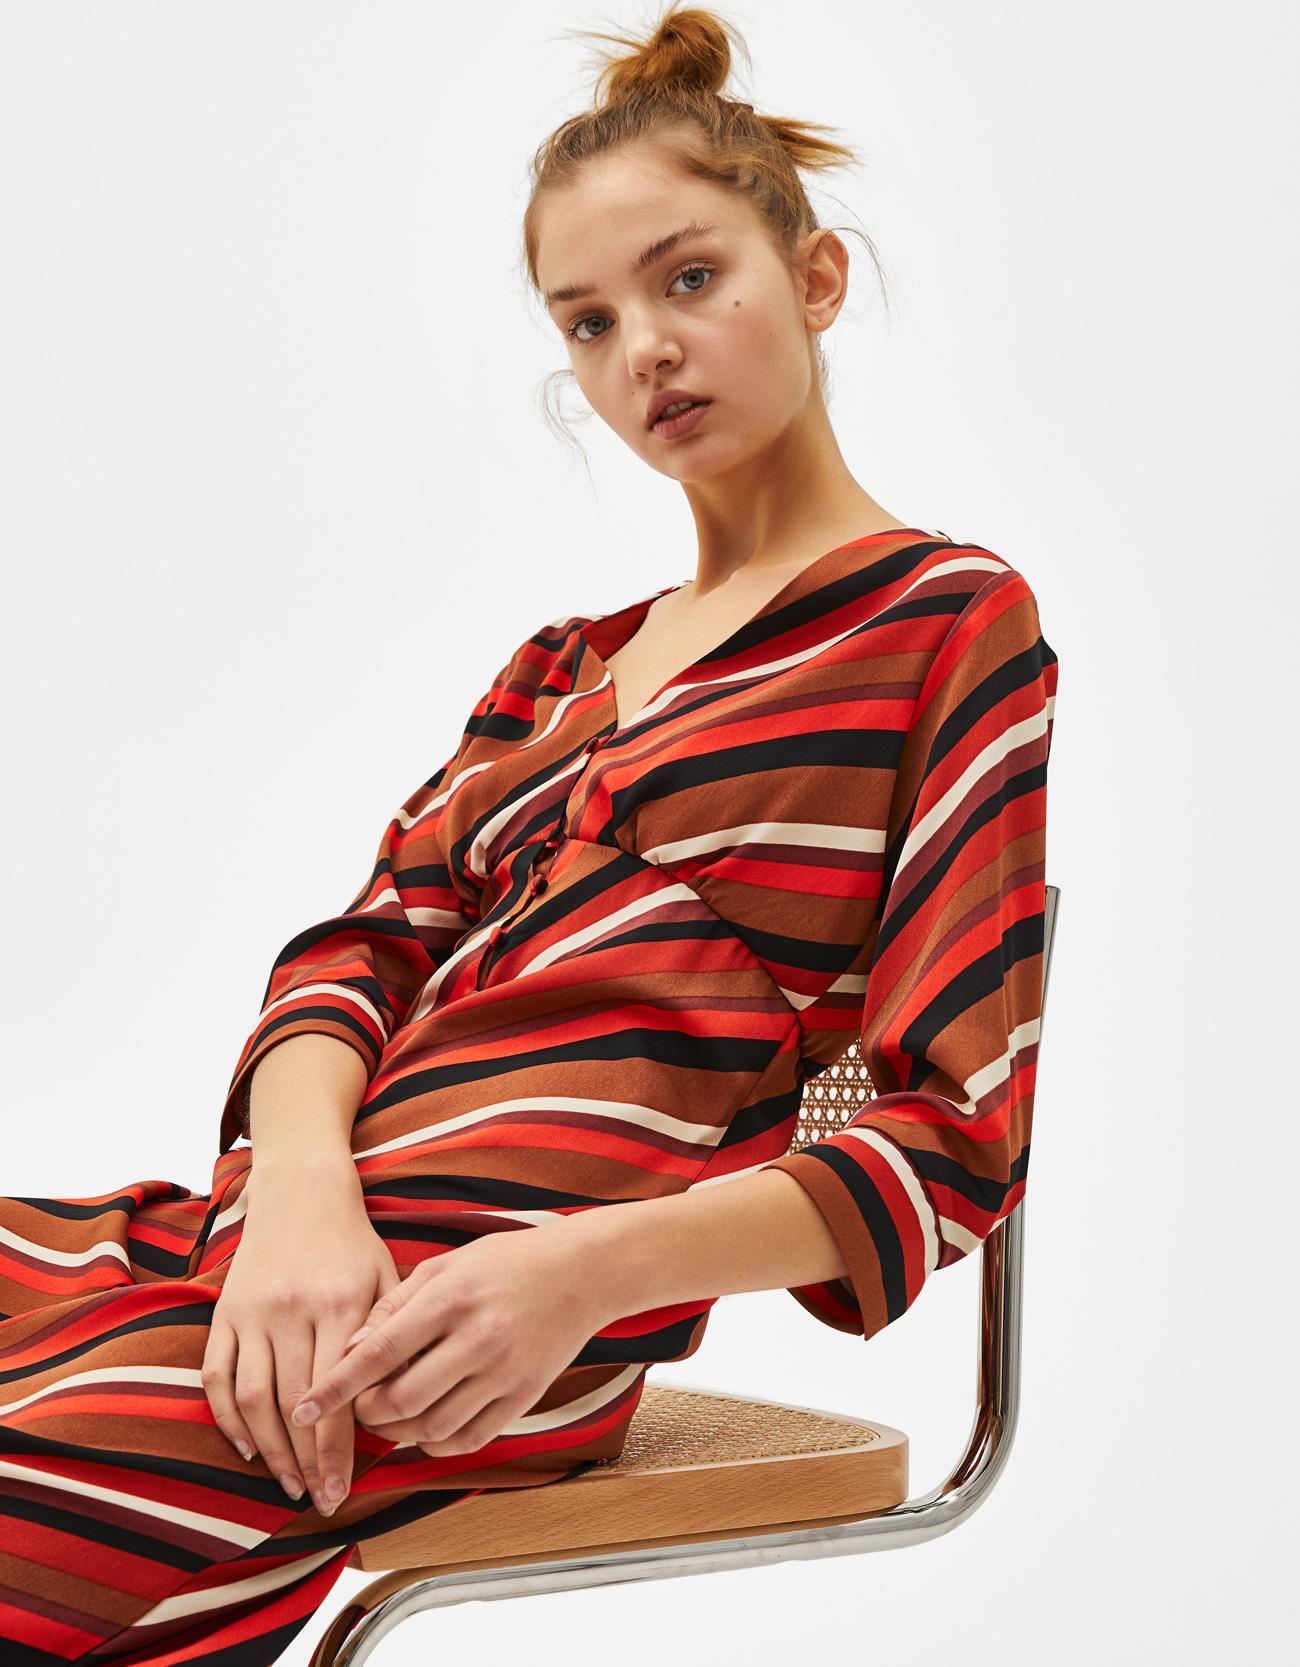 b887191a8d8 Flowing striped dress - Dresses - Bershka Lithuania